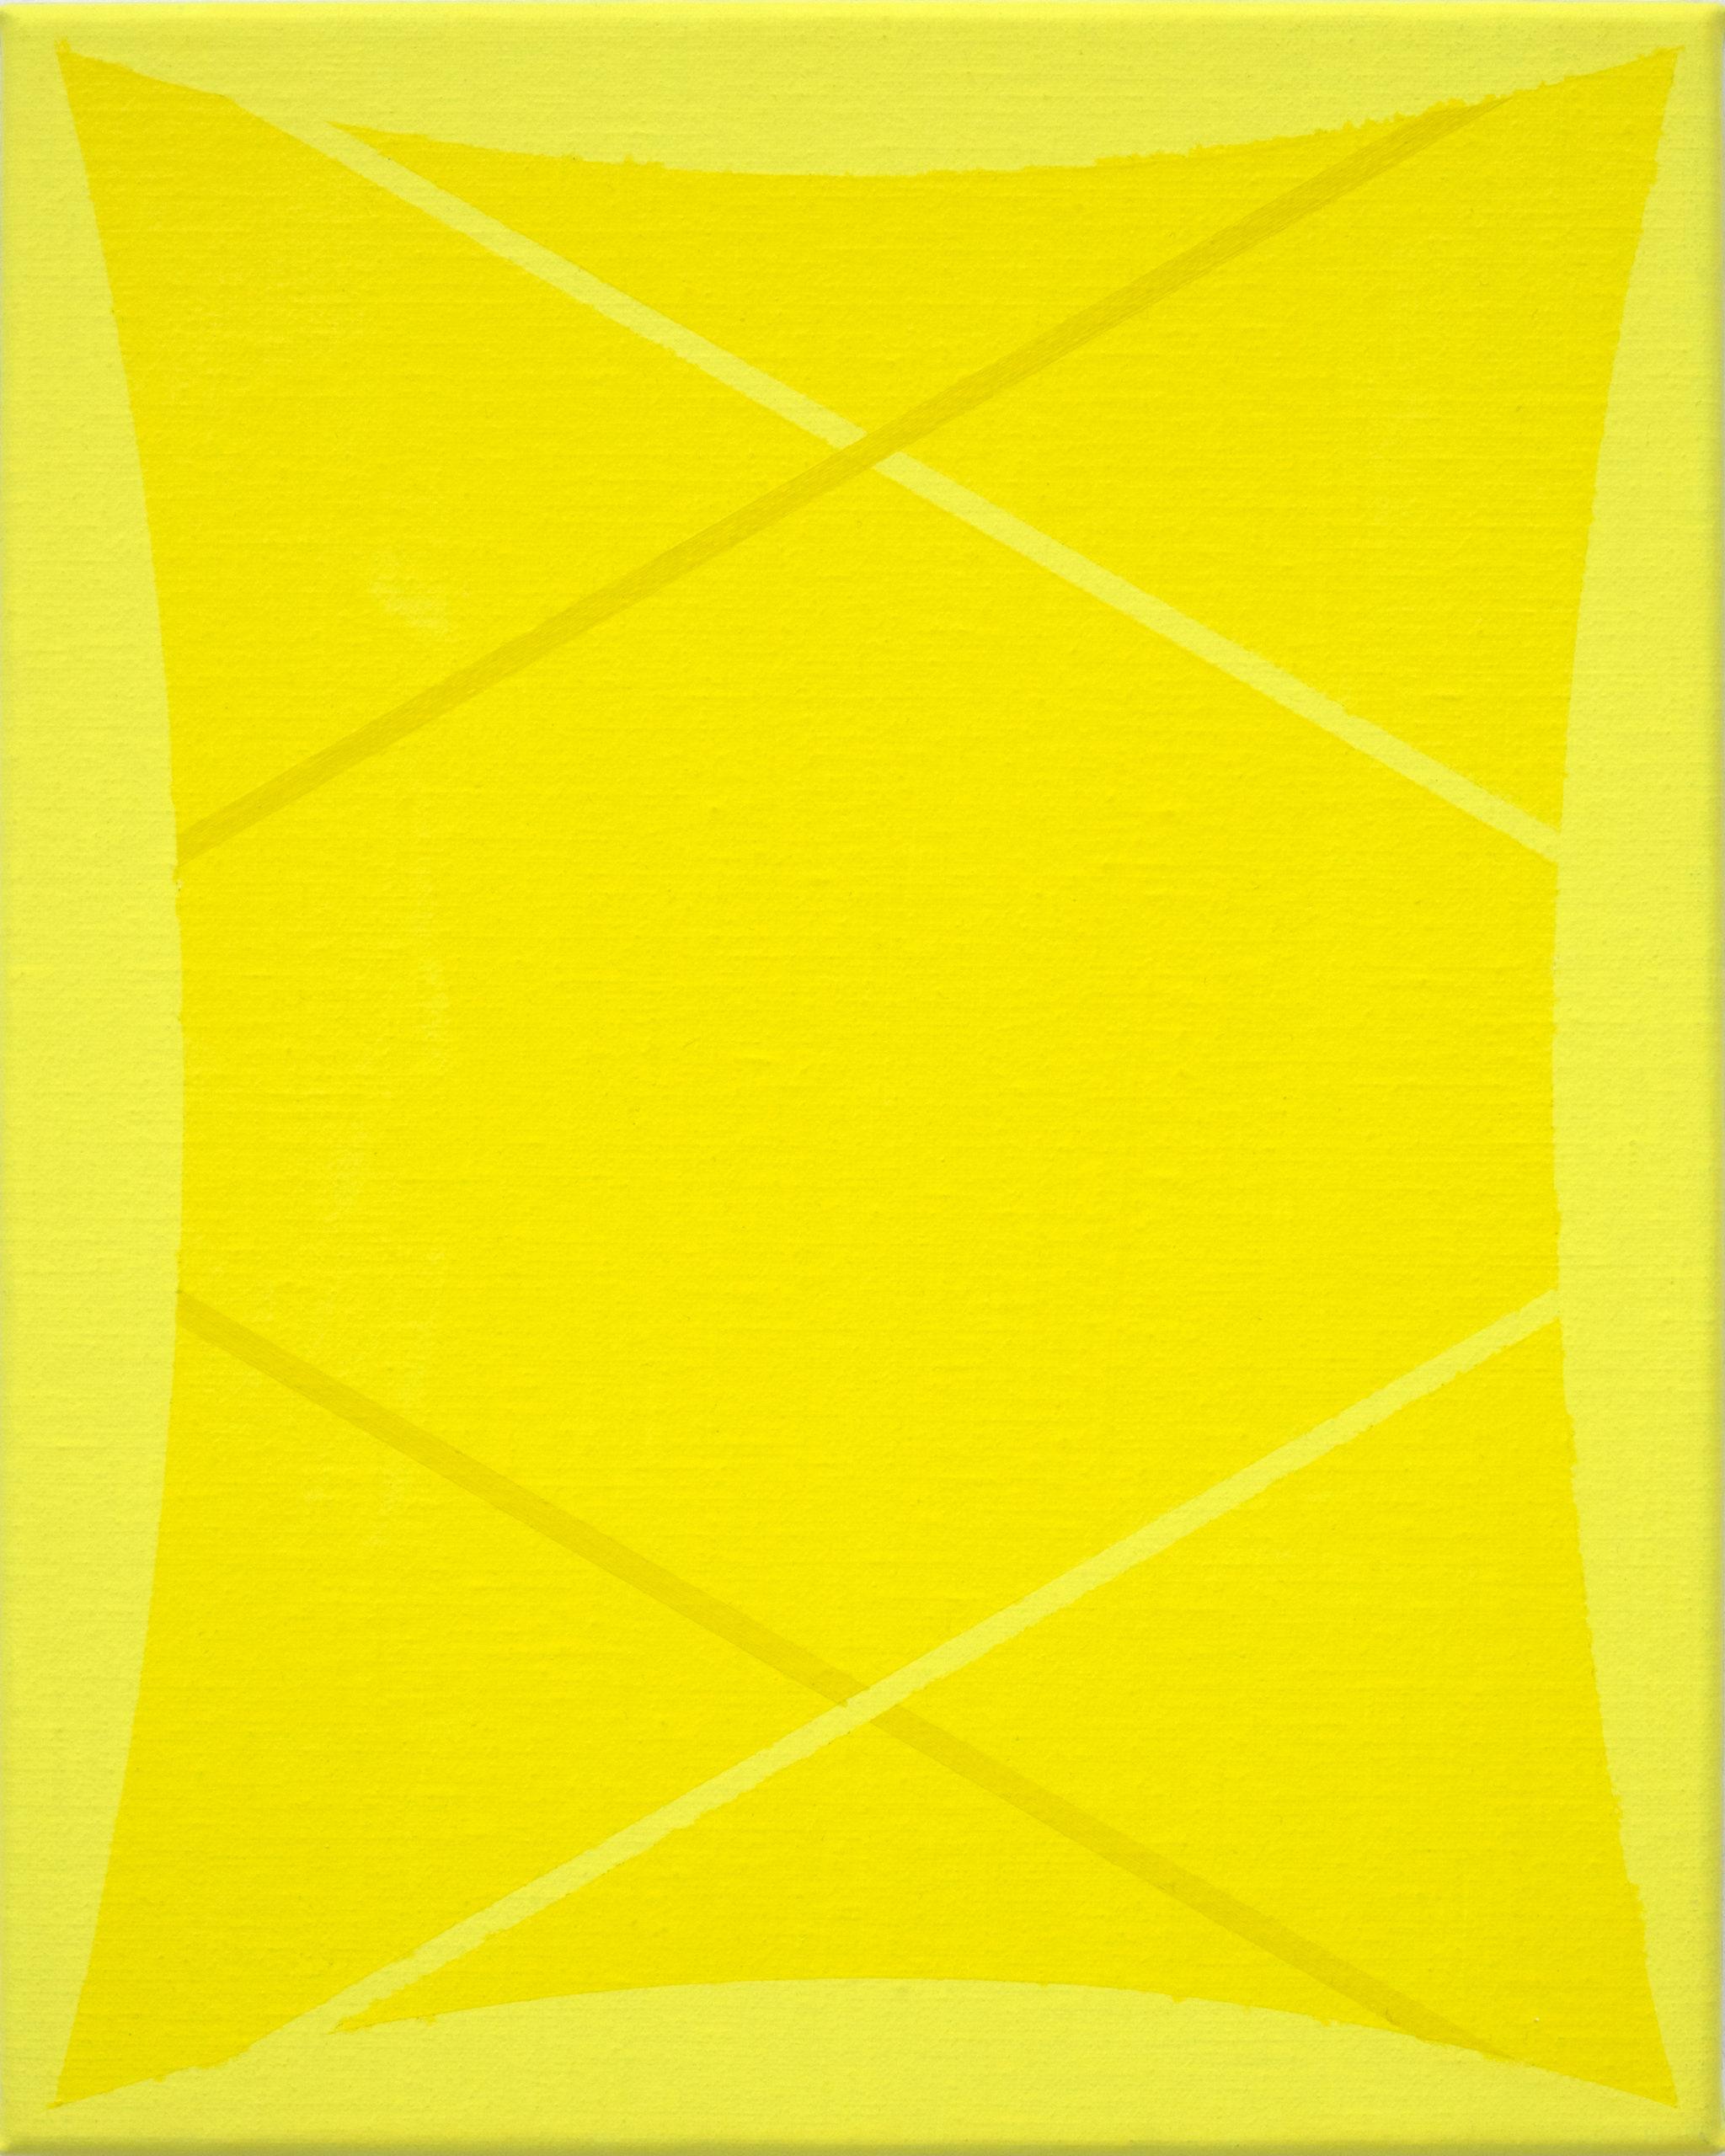 Untitled (Three Yellows)